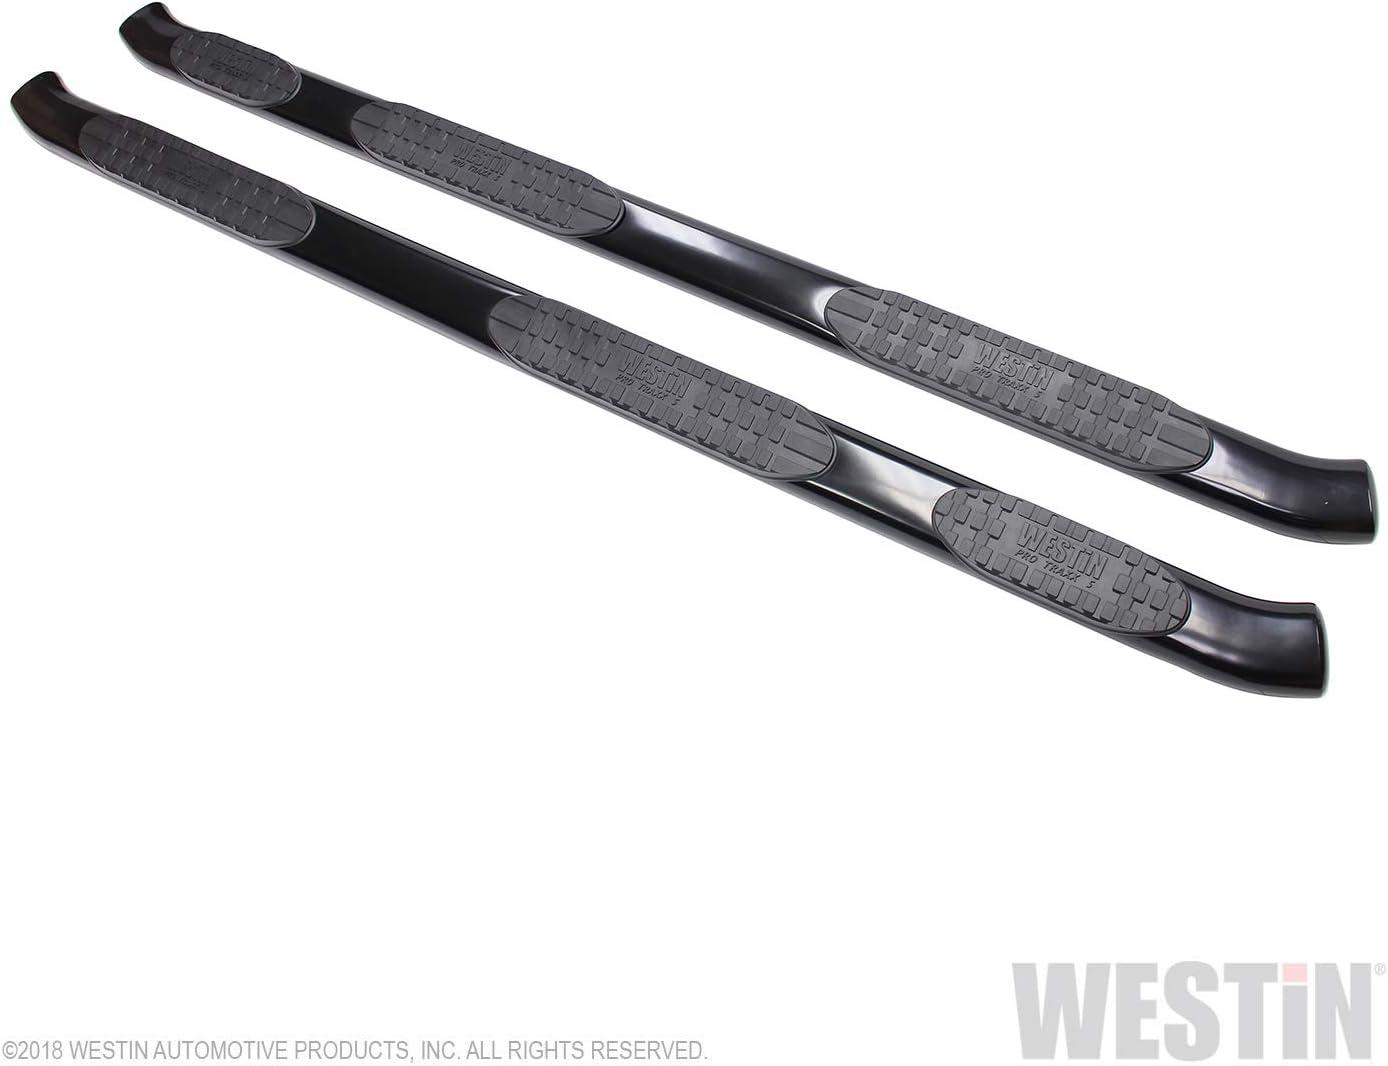 Westin 21-533515 Nerf Bar